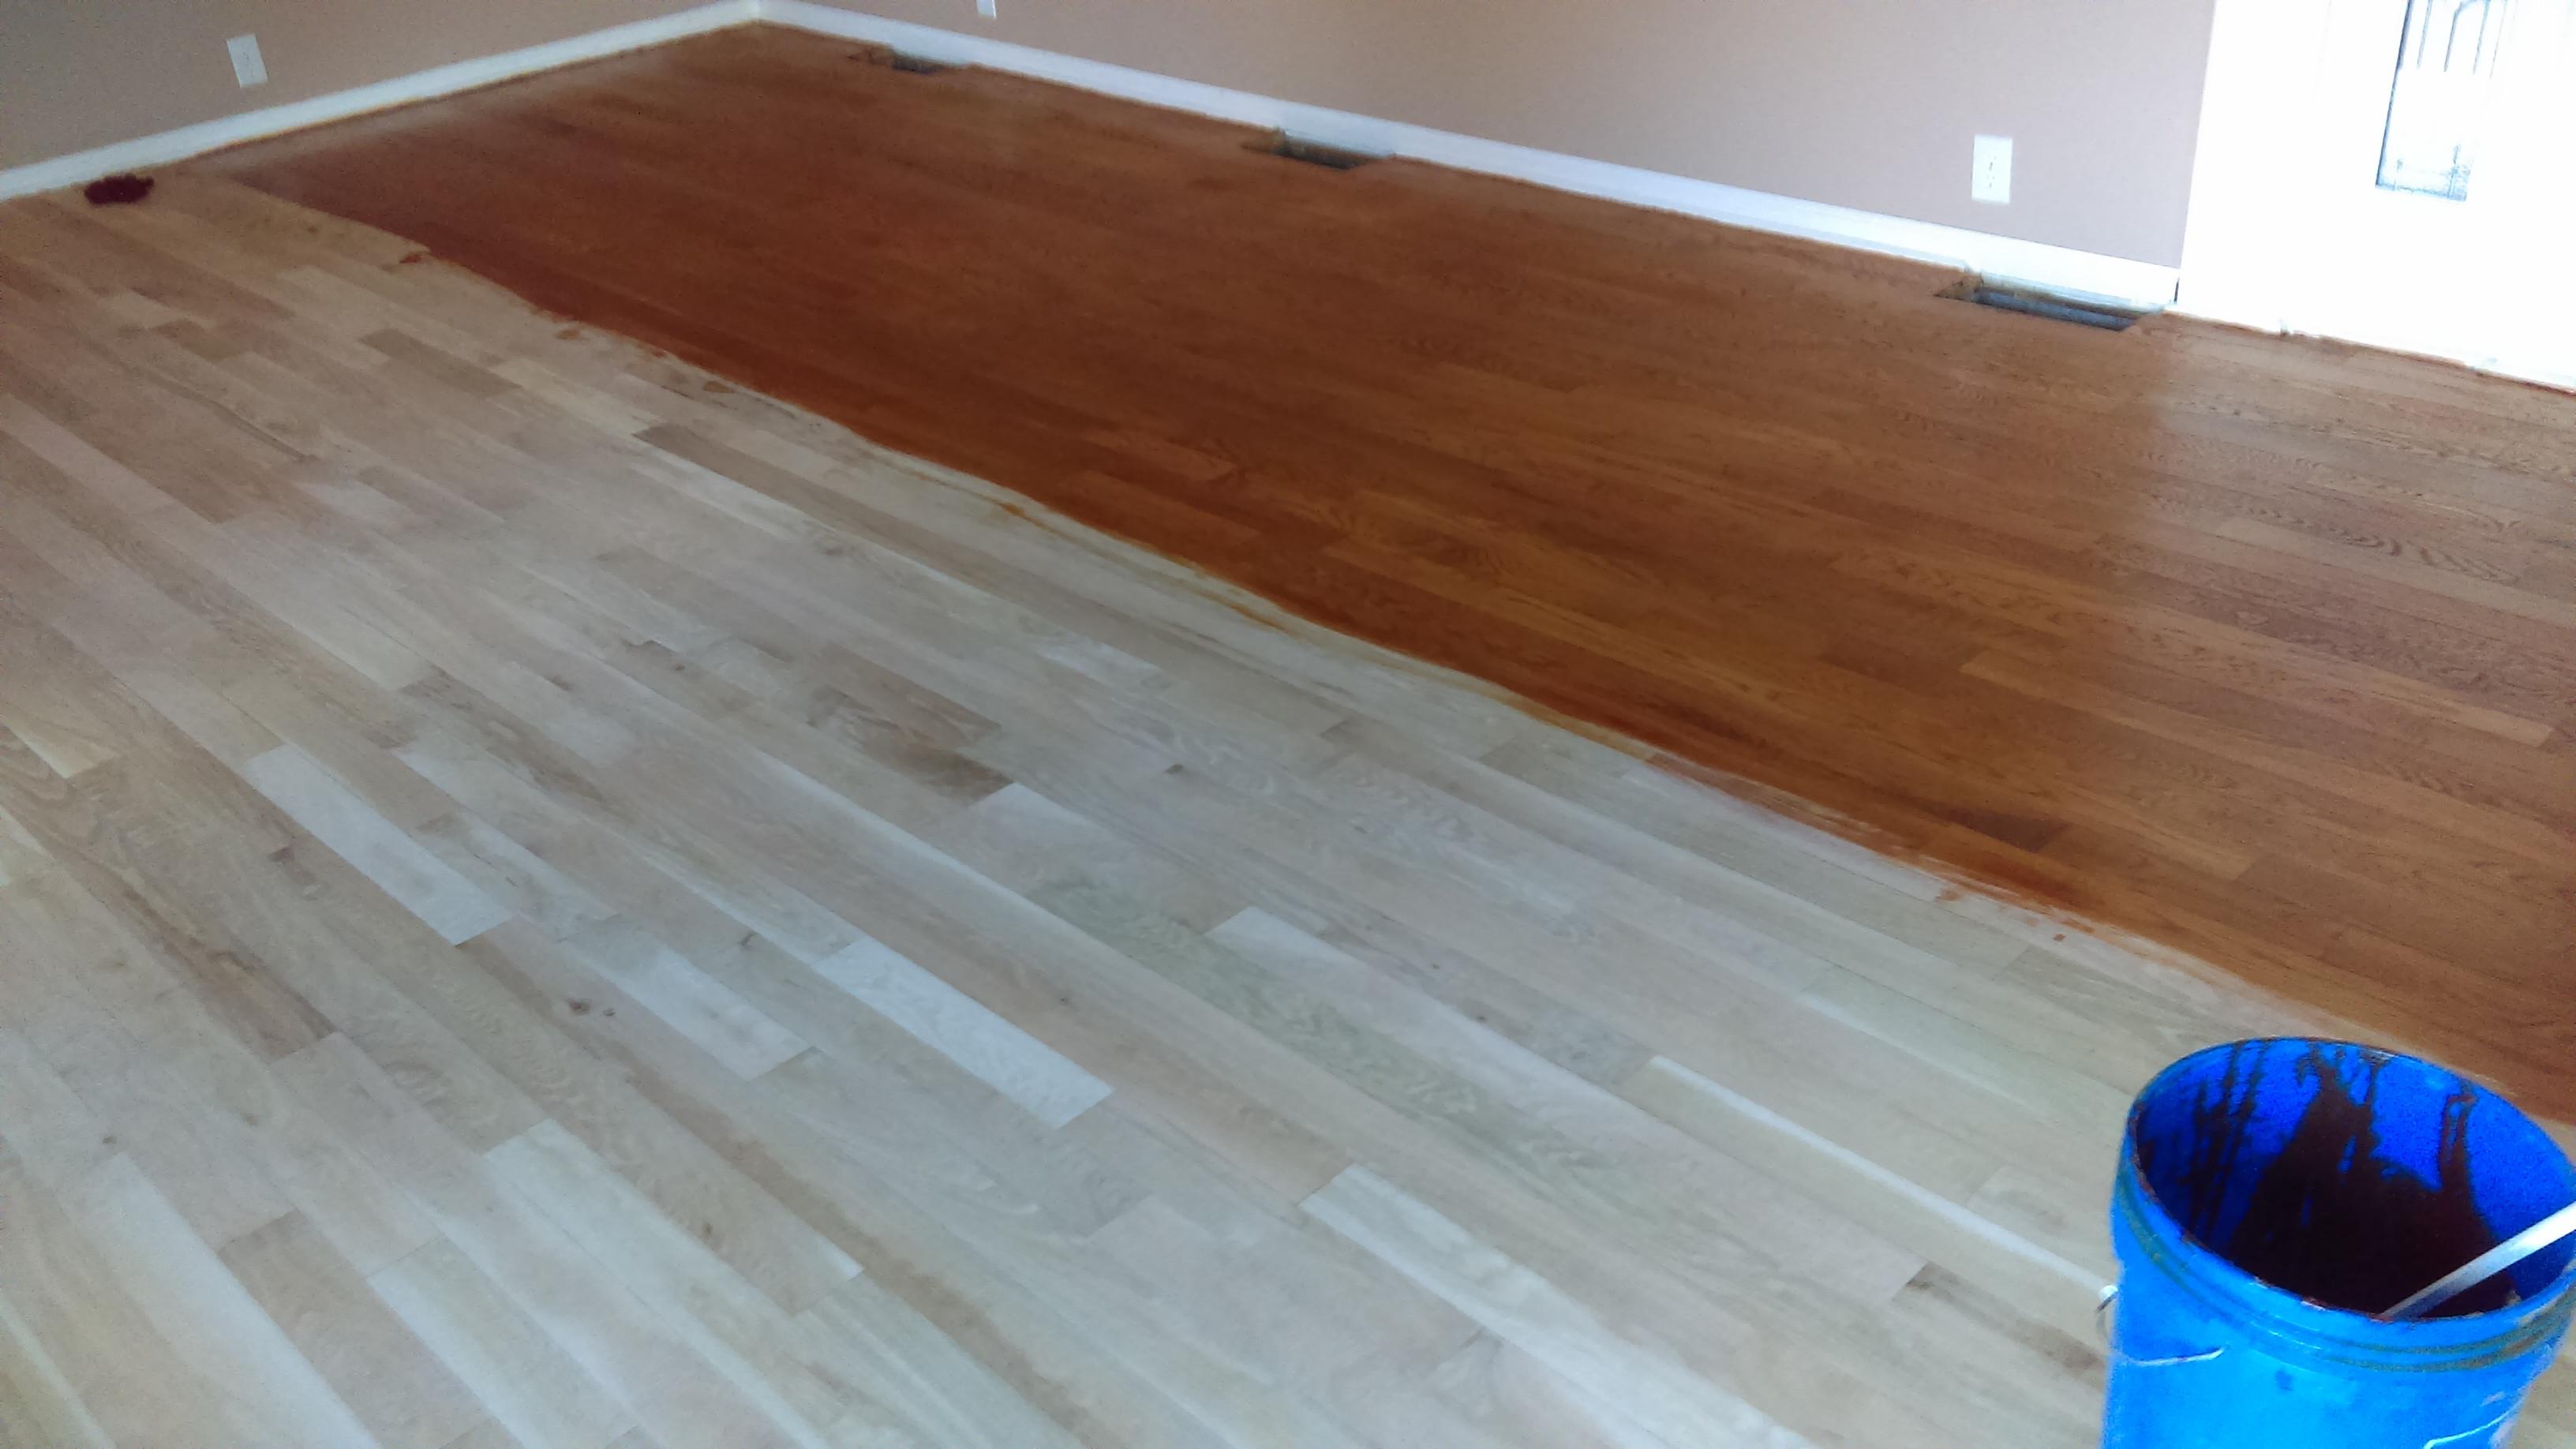 Hardwood Floor Refinishing Pasadena Ca Of Sandingsquad Hardwood Refinishing Houston 281 623 1698 for Sandingsquad6